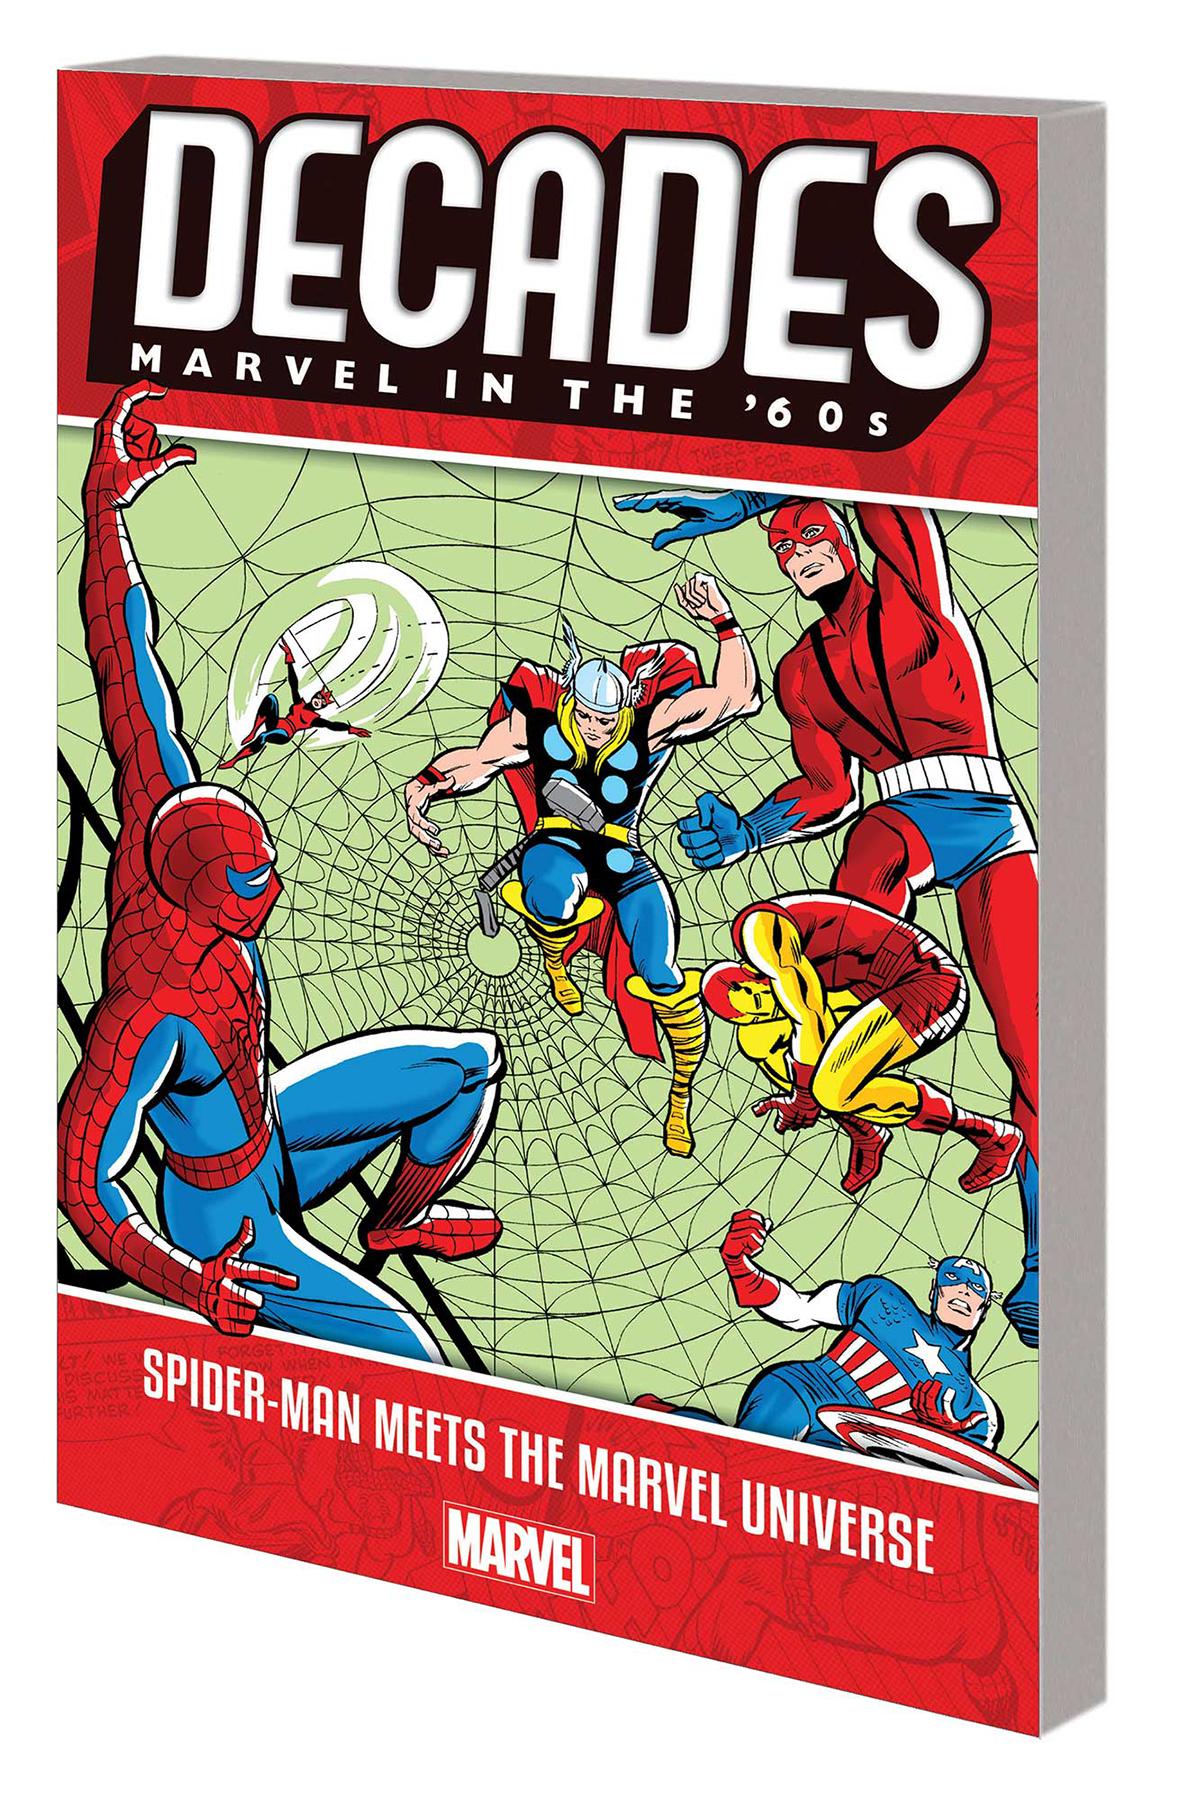 Decades Marvel 60S Tp Spider-Man Meets Marvel Universe (STL108386)